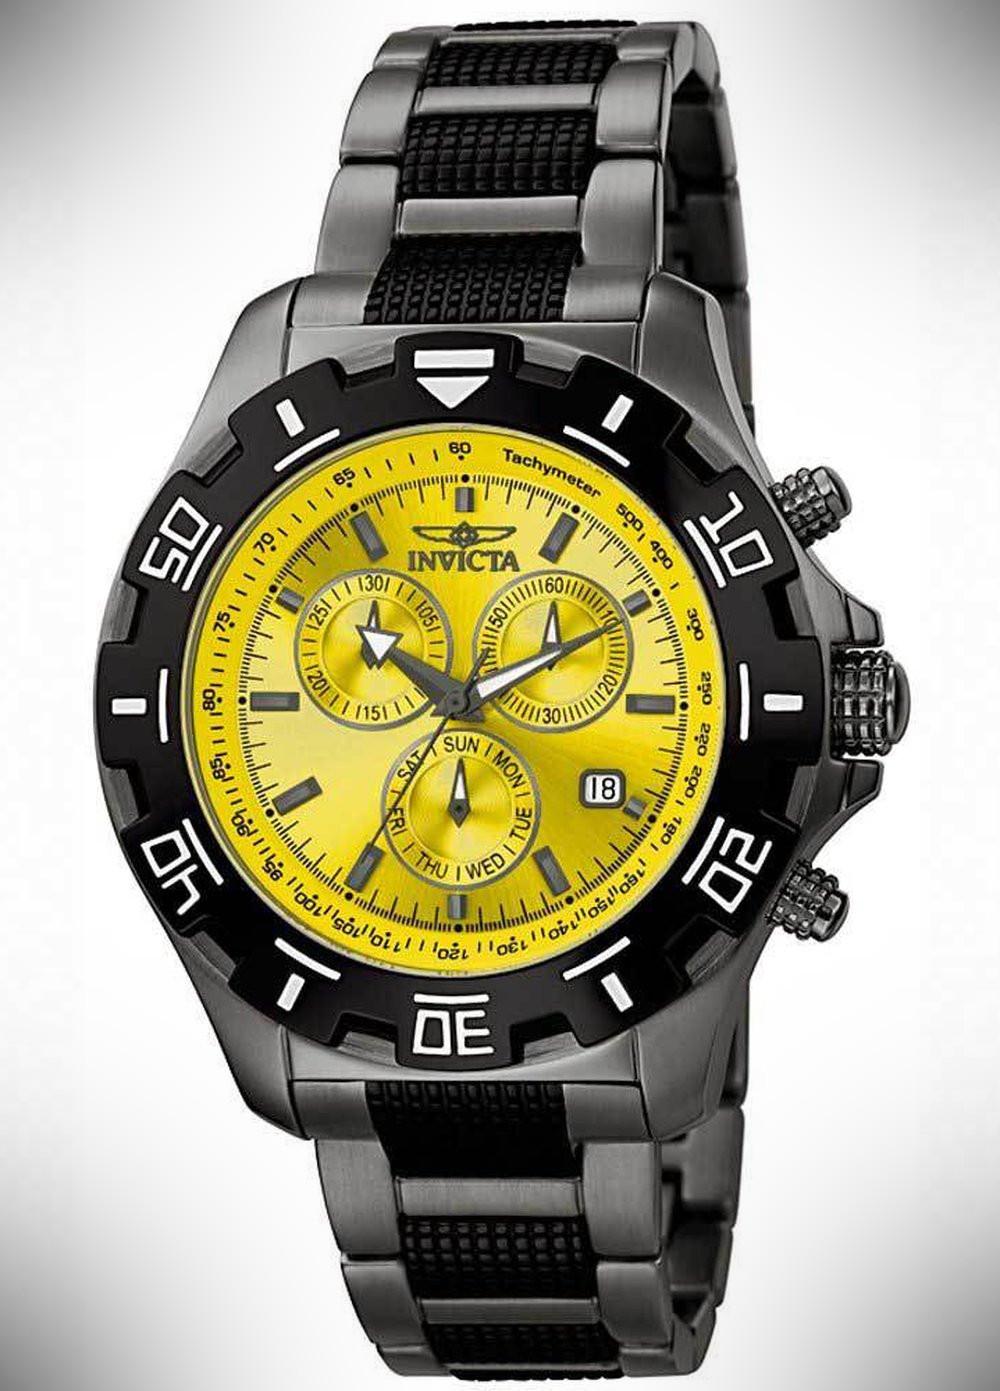 6410 Python – invicta watch